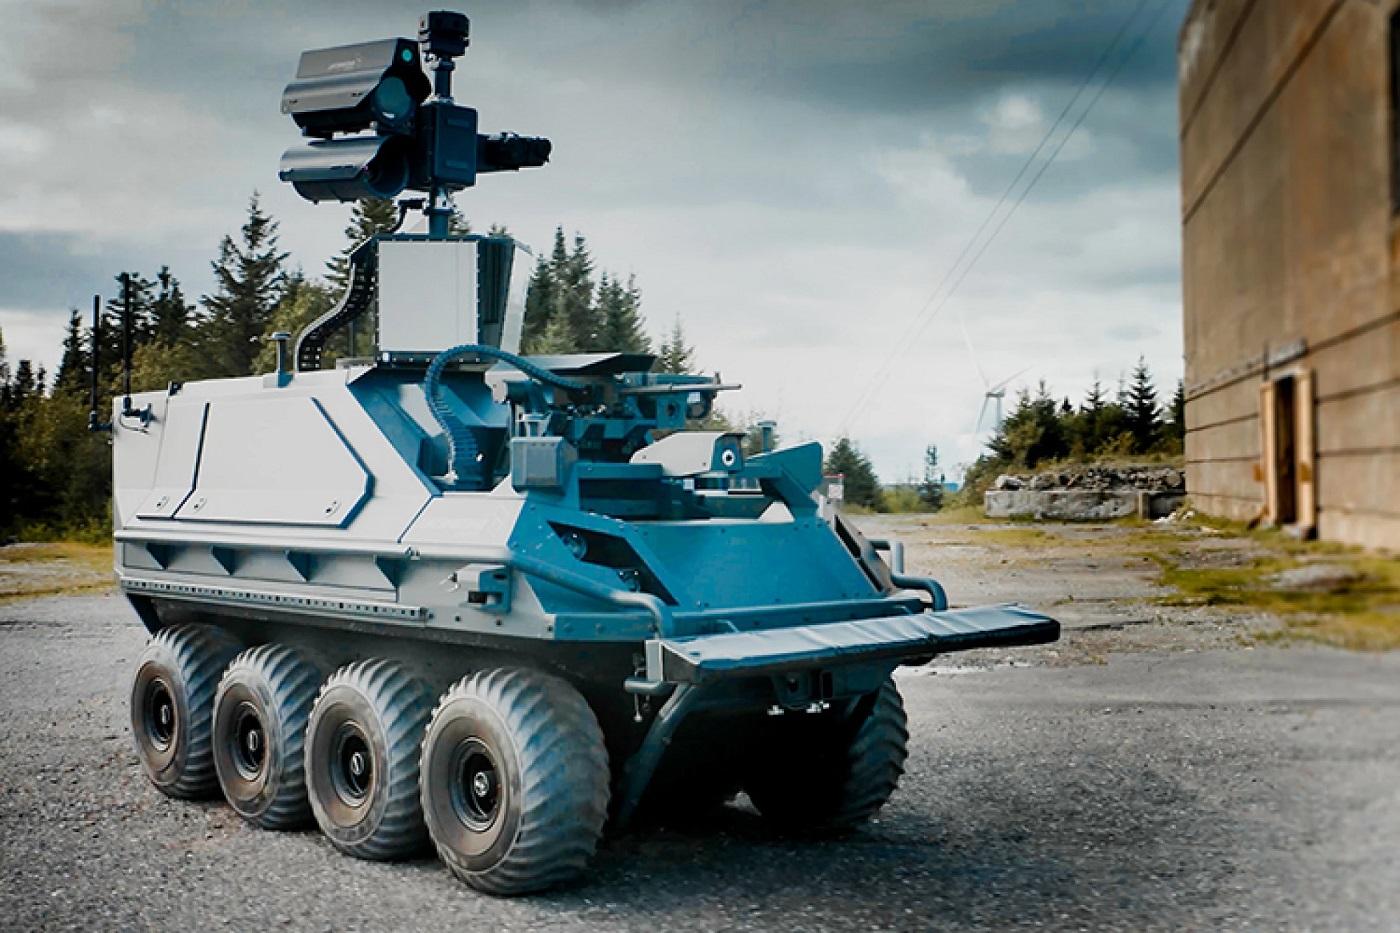 Nový bojový robot Mission Master – Armed Reconnaissance. Kredit: Rheinmetall.